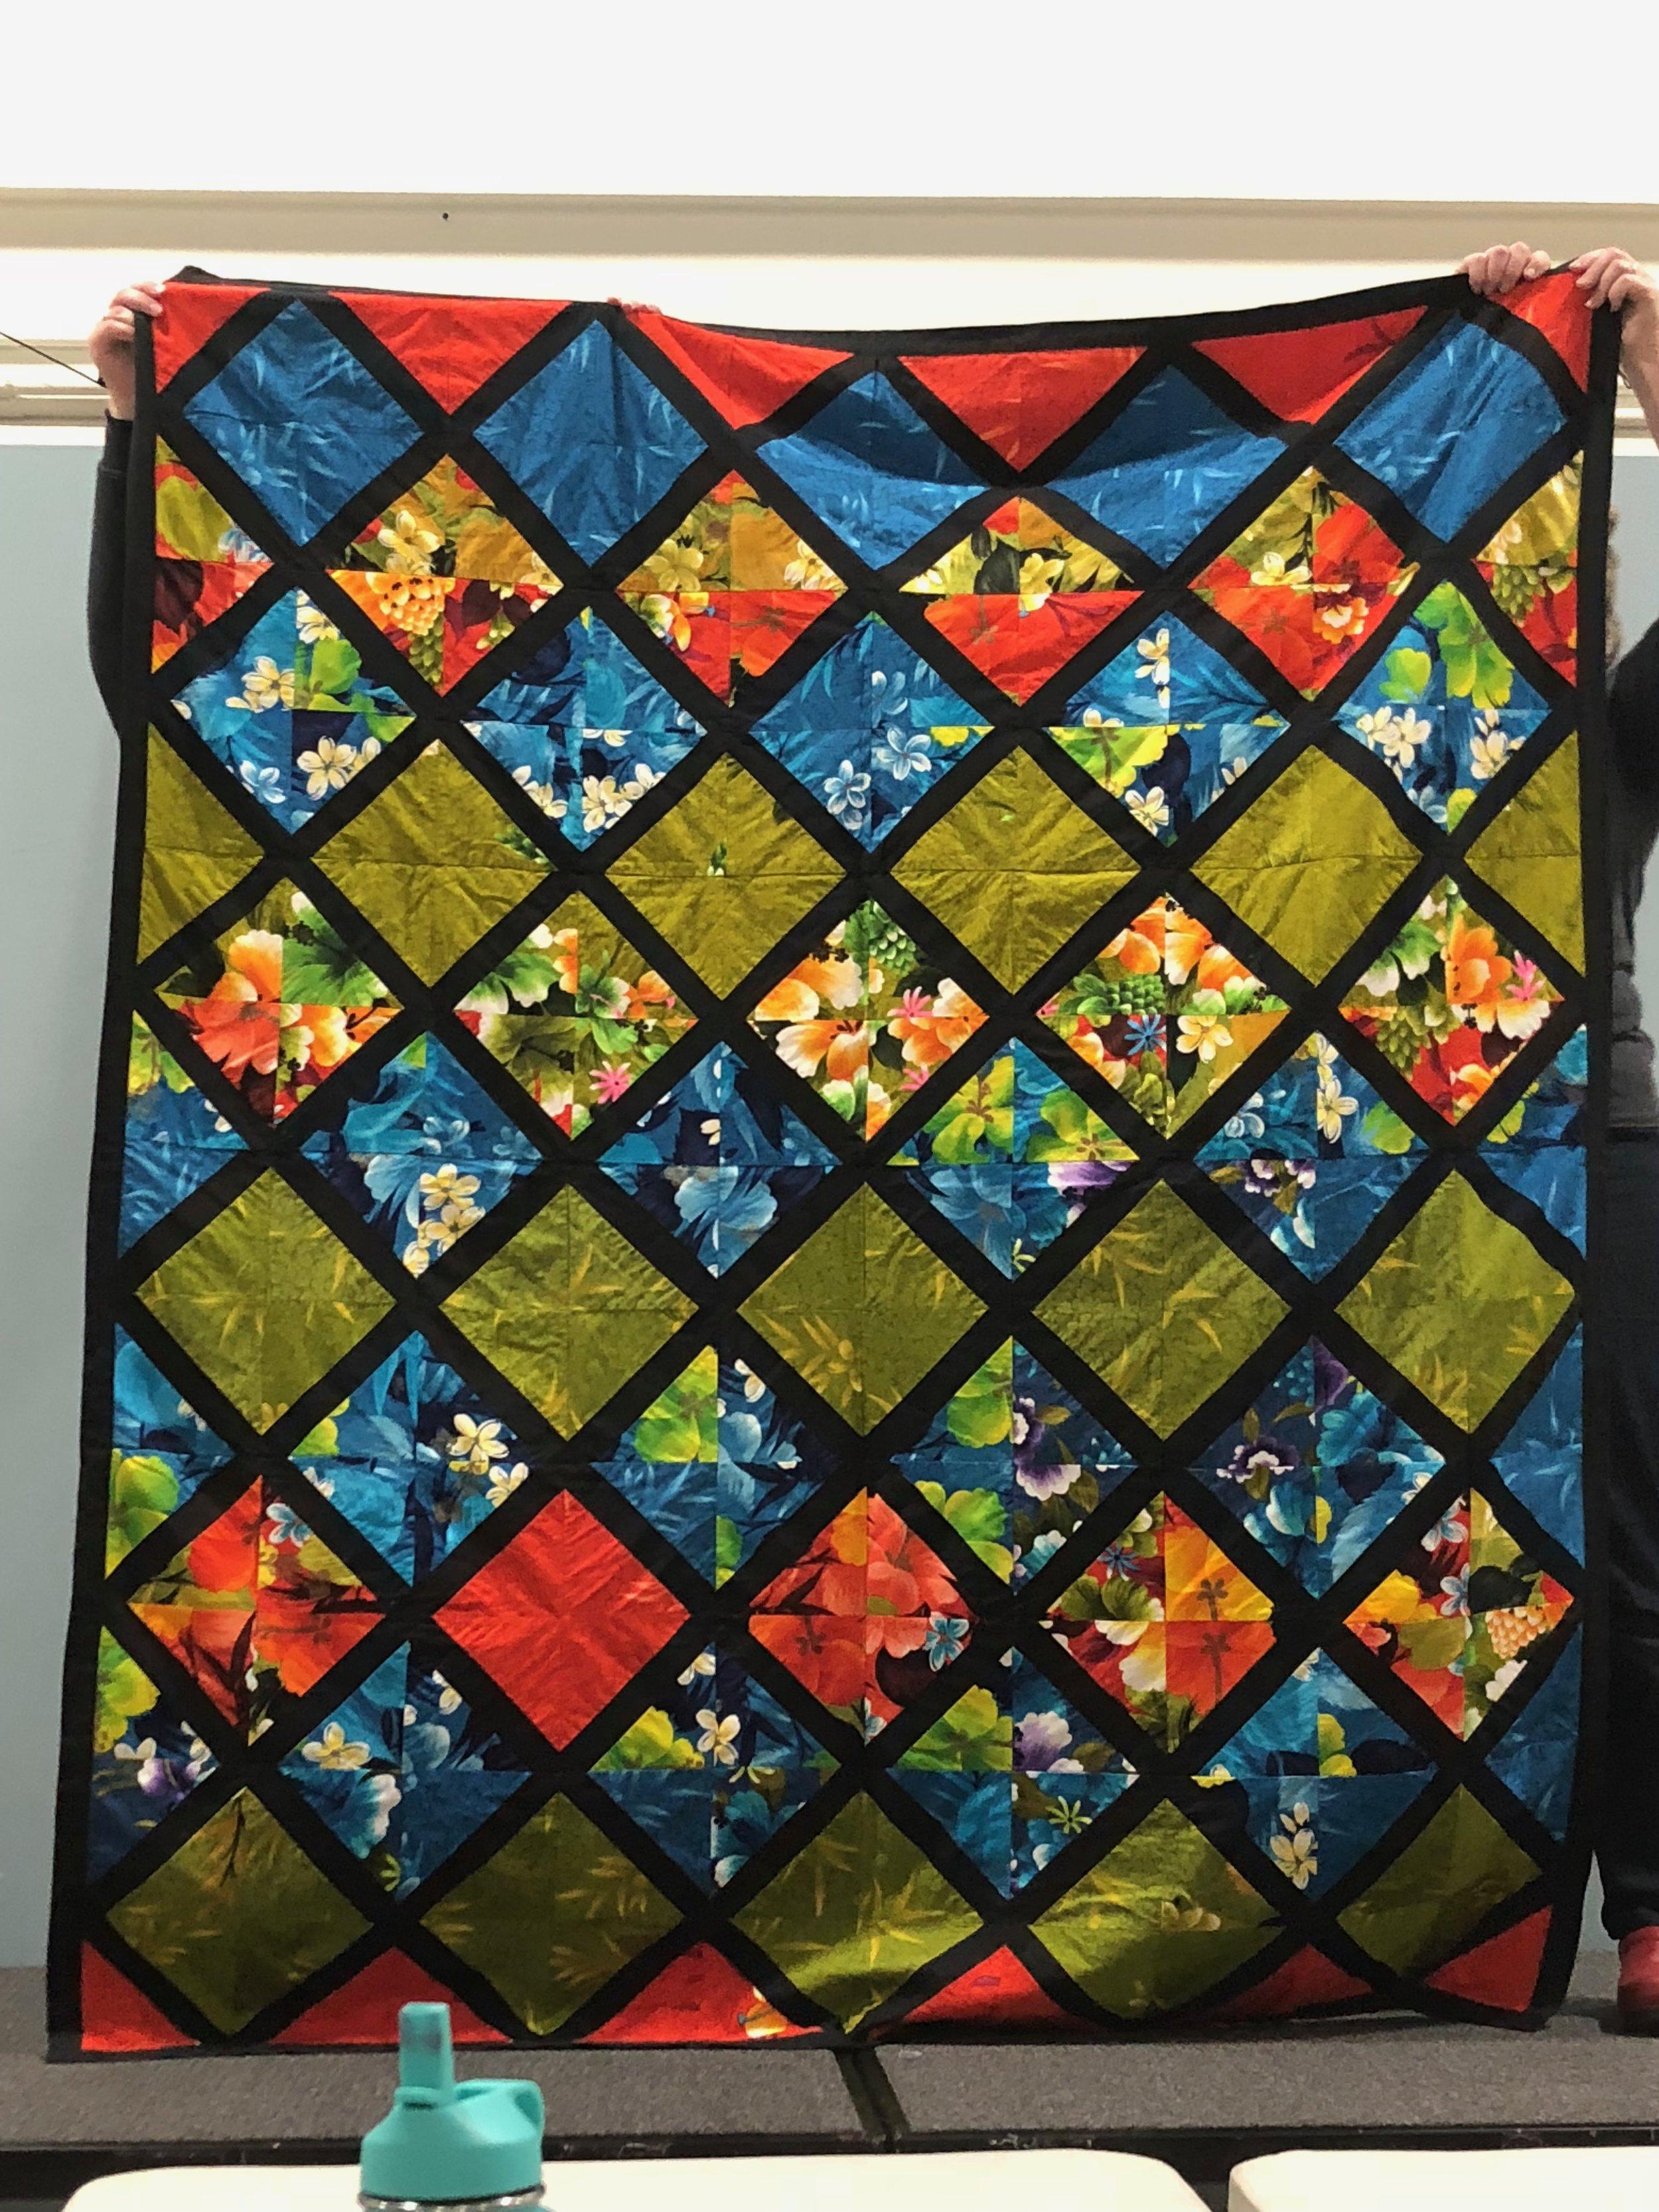 1970s Hawaiian Scrap Quilt presented by Bill Volckening